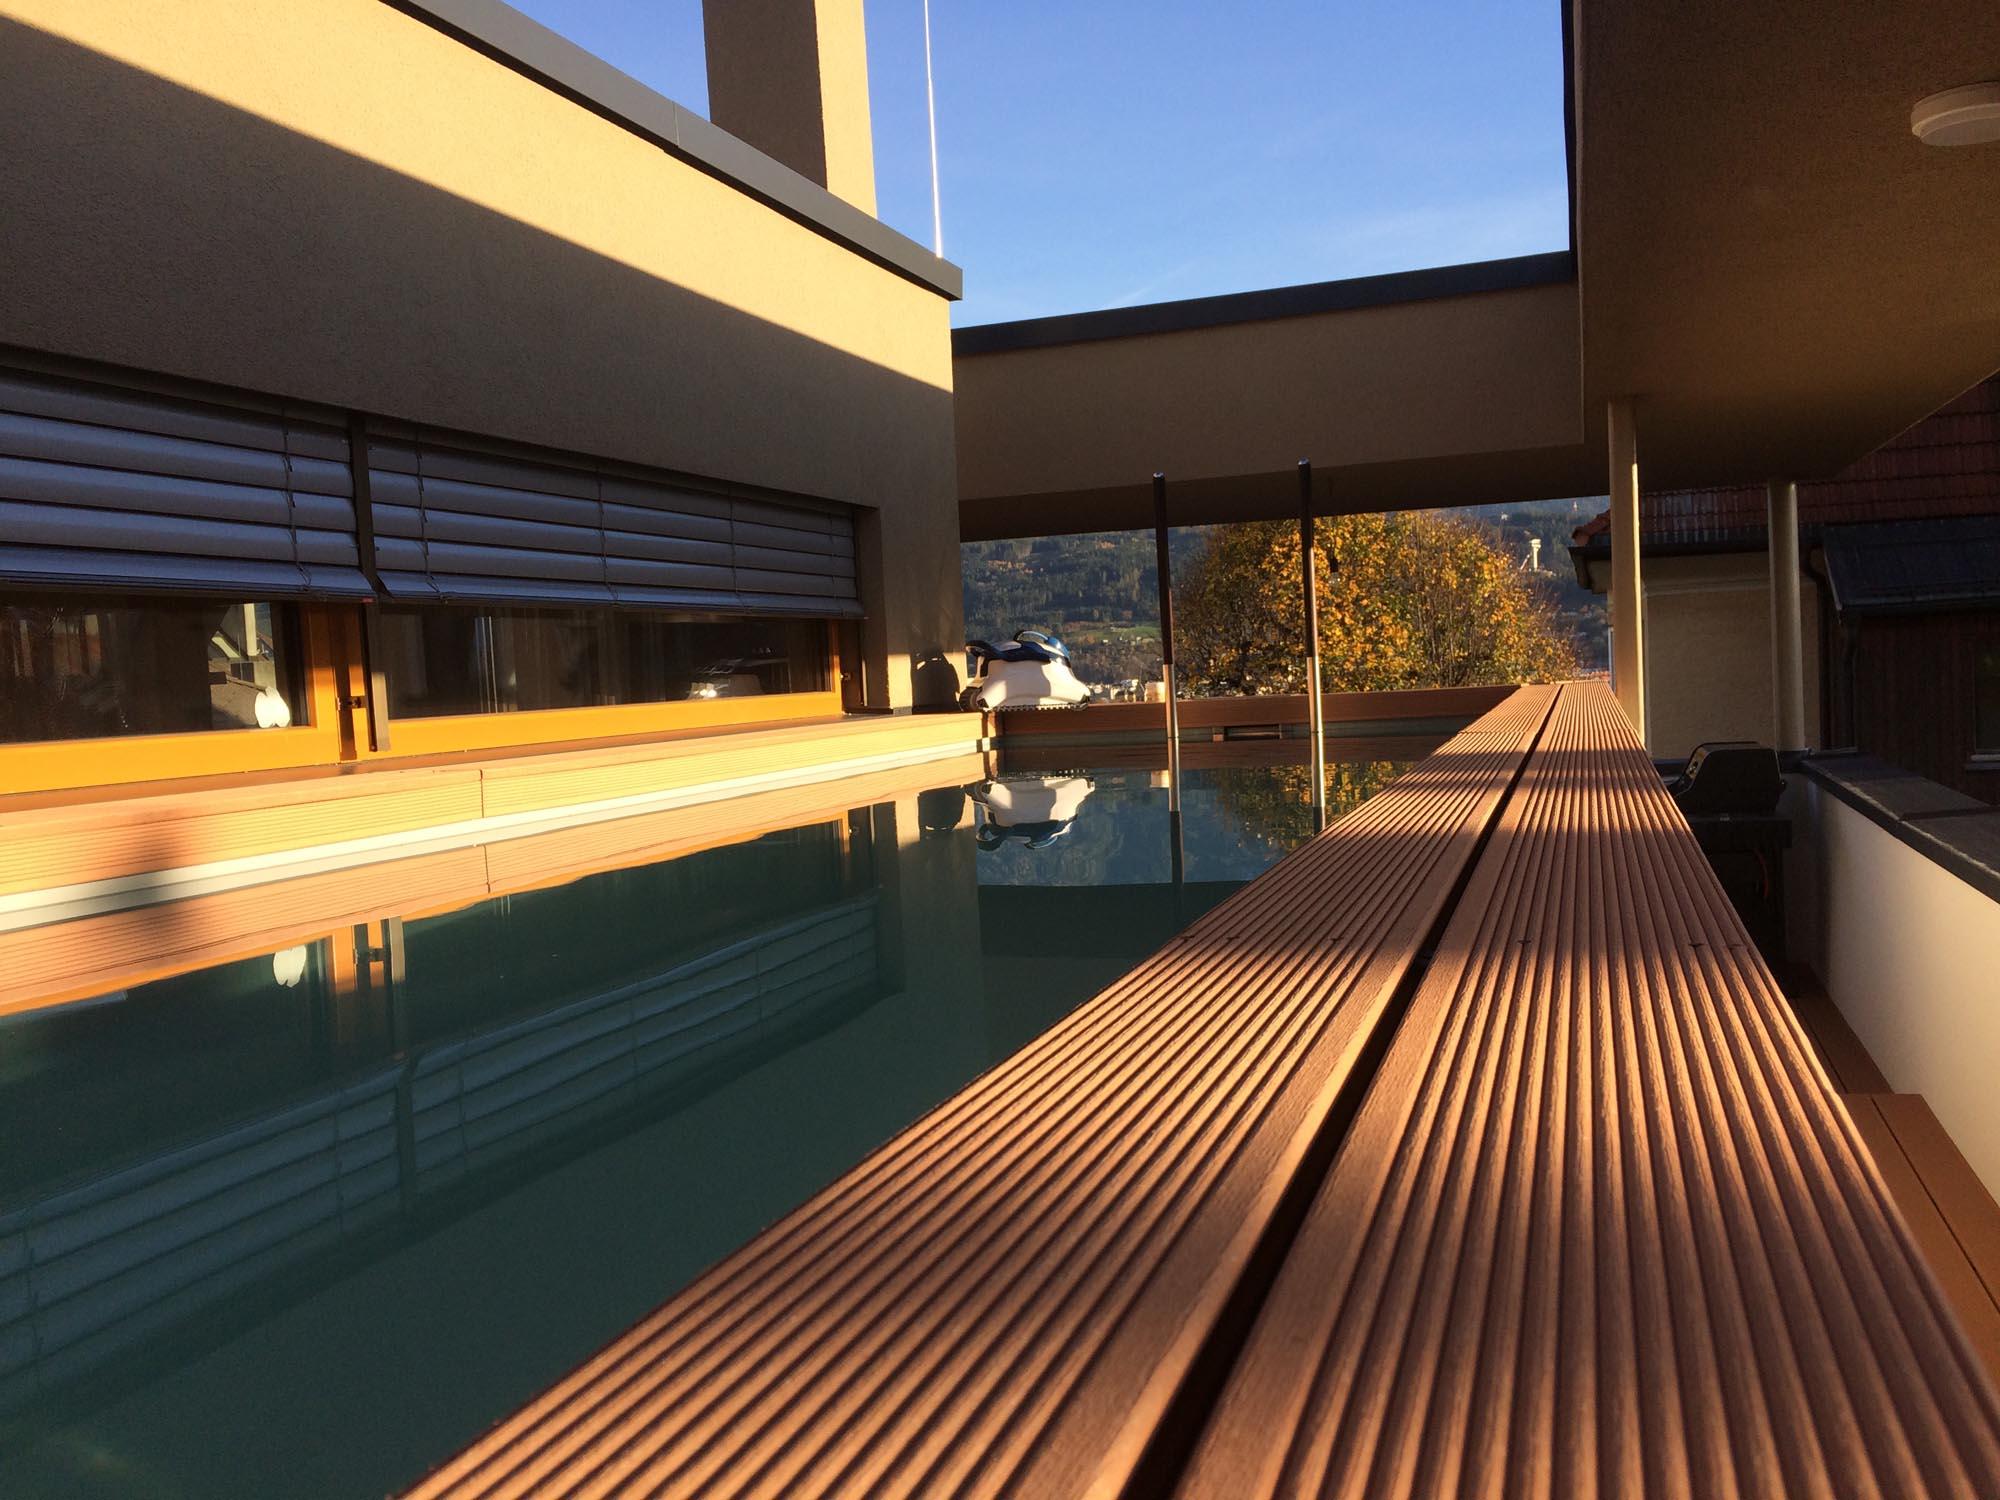 Pool - Schwimmbadbau Tirol - SST Saurwein Schwimmbad Technik